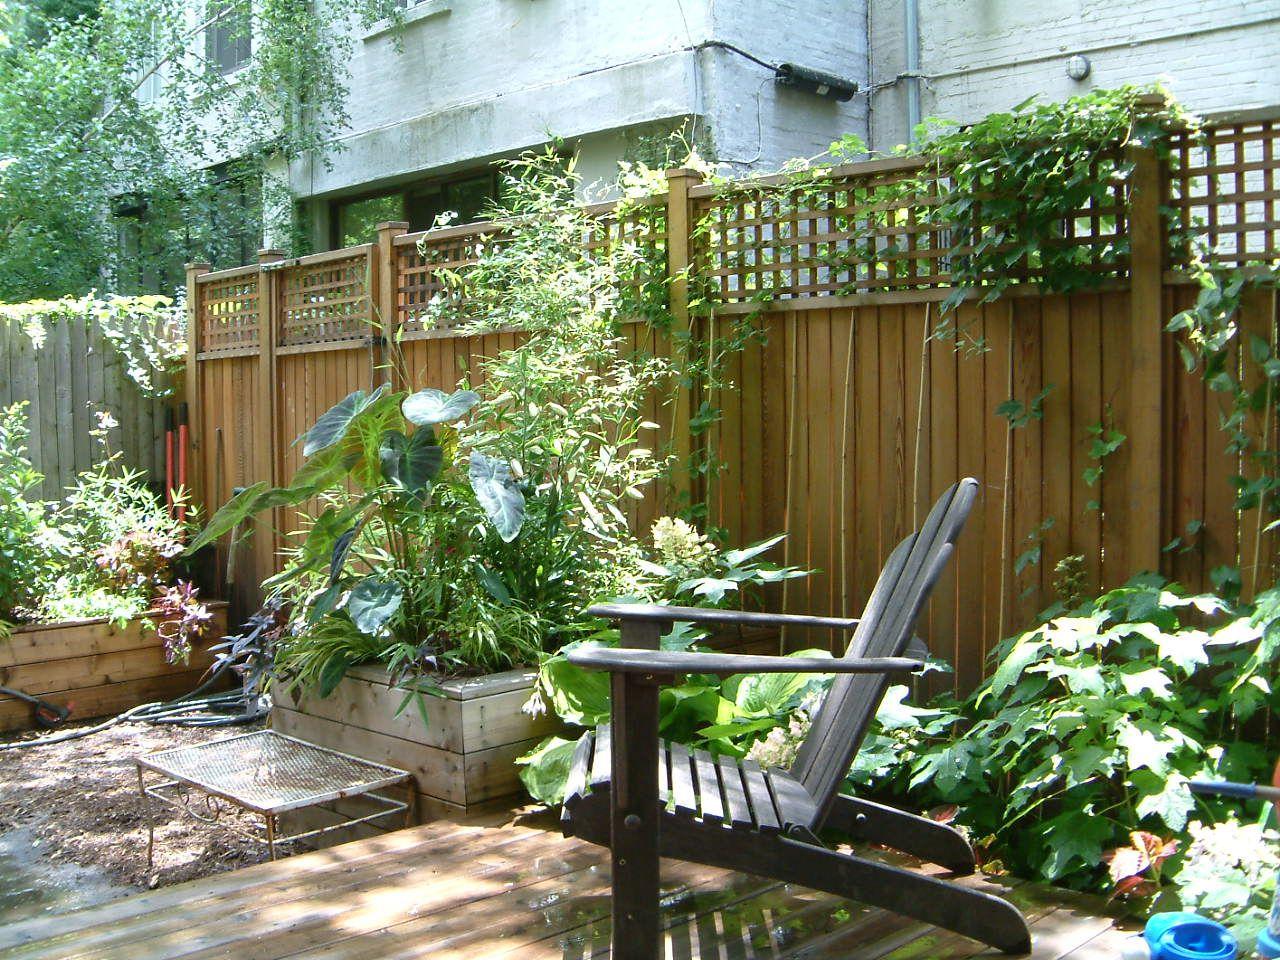 Nyc Garden Design nyc terrace design roof garden bluestone paver patio deck planters jacuzzi Brownstone Garden Chelsea Nyc